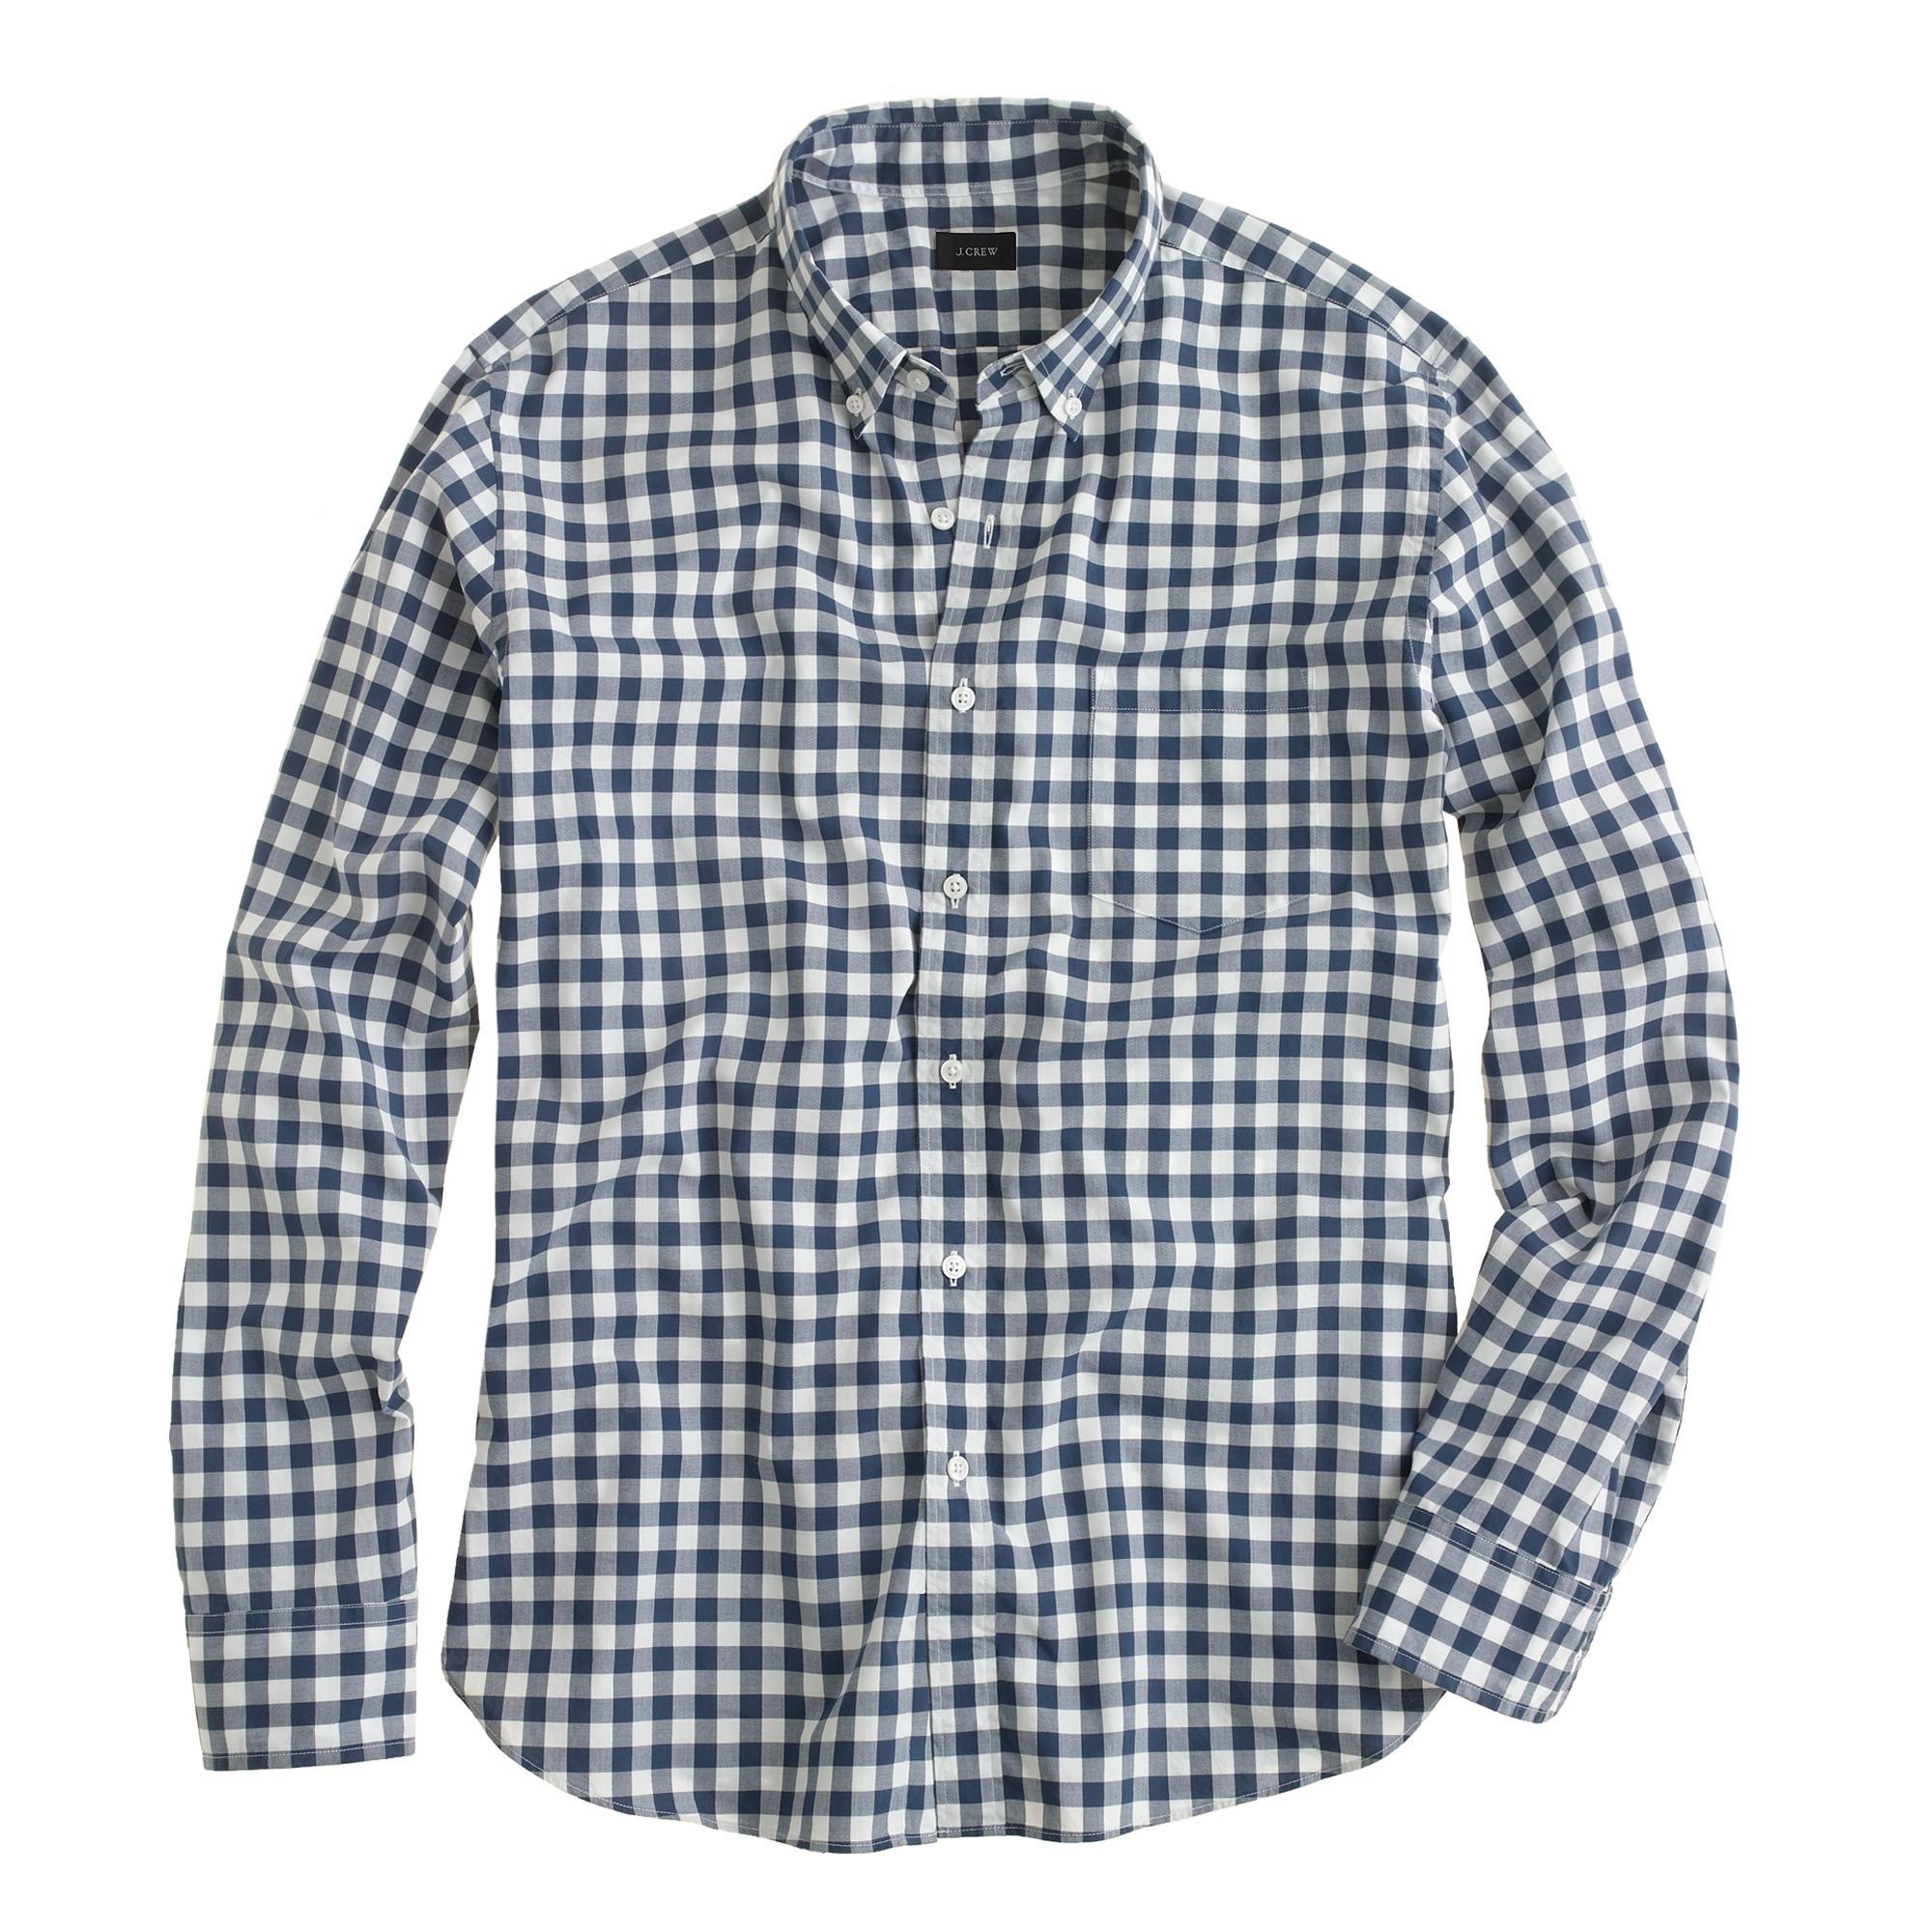 Secret Wash Shirt In Faded Gingham : Men's Shirts | J.Crew